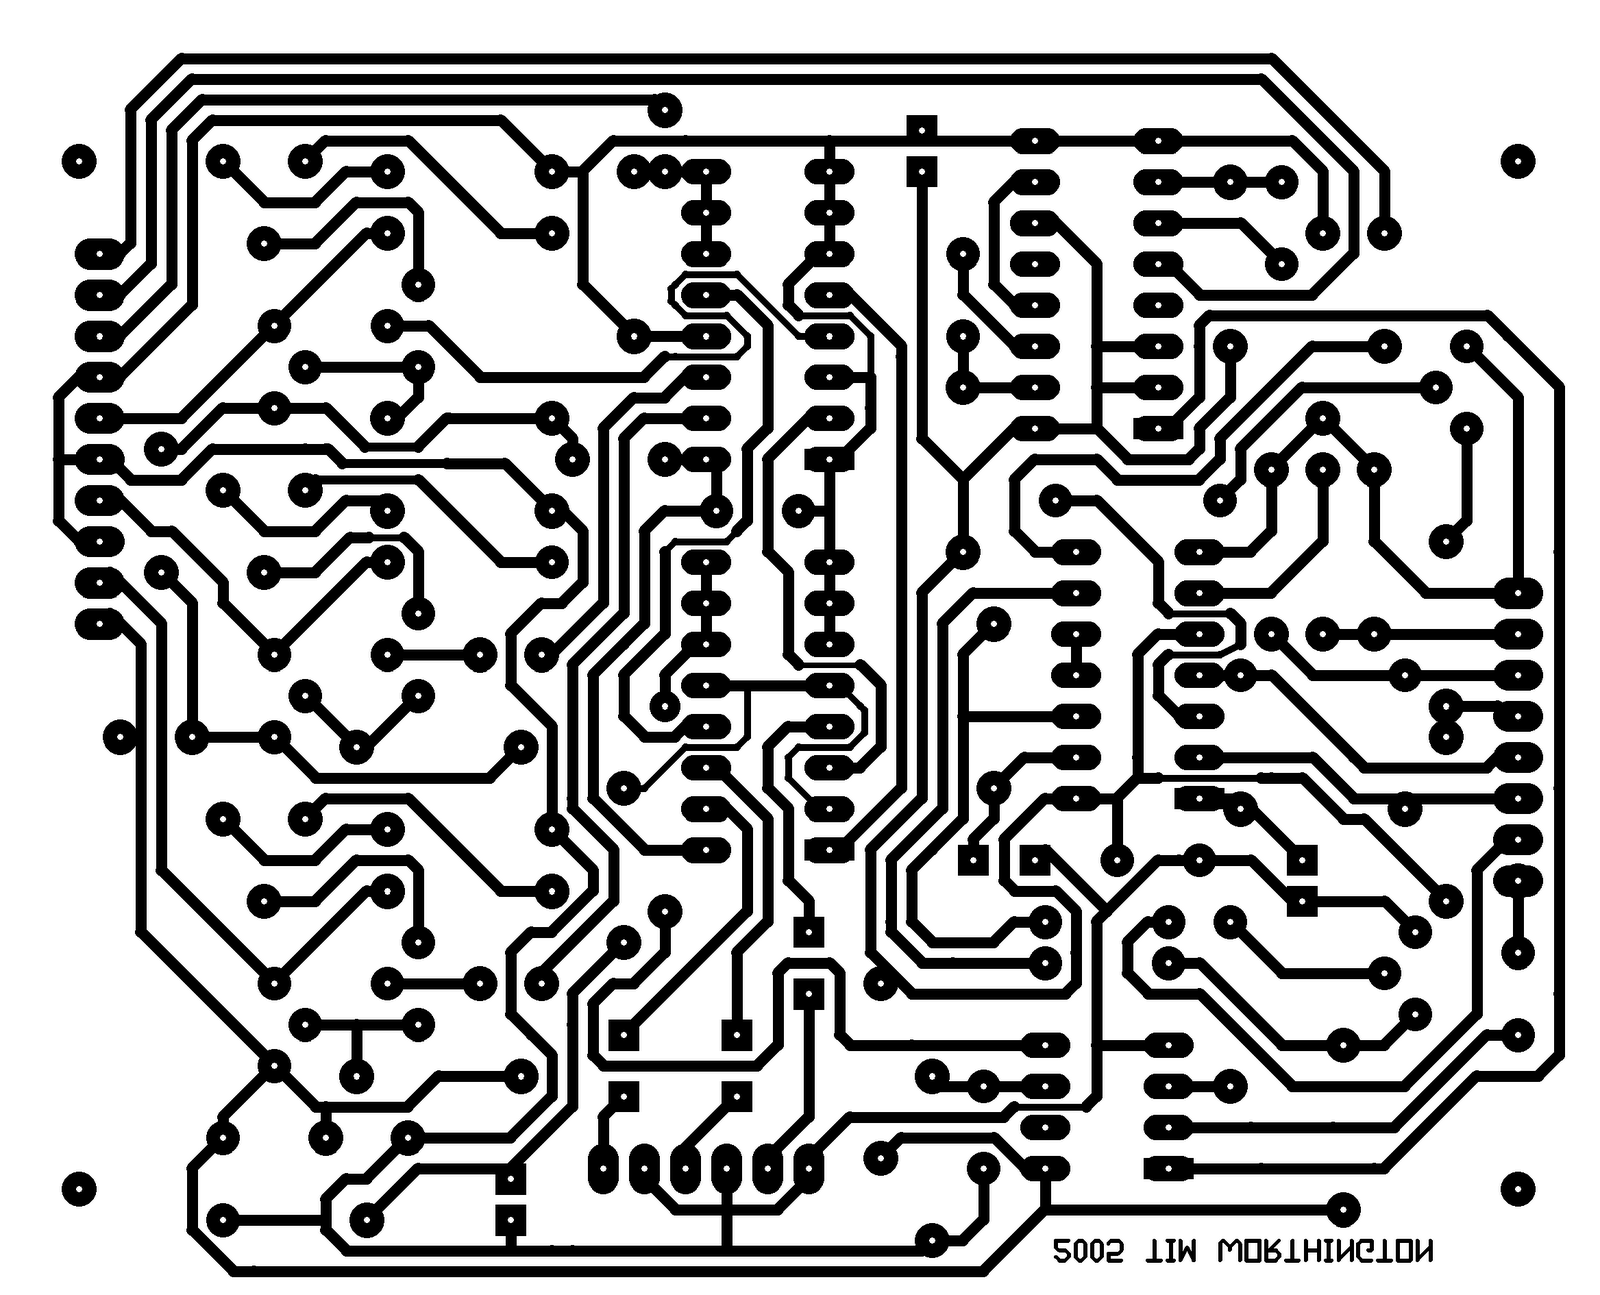 Tecnologia Informatica Imagenes De Pcb